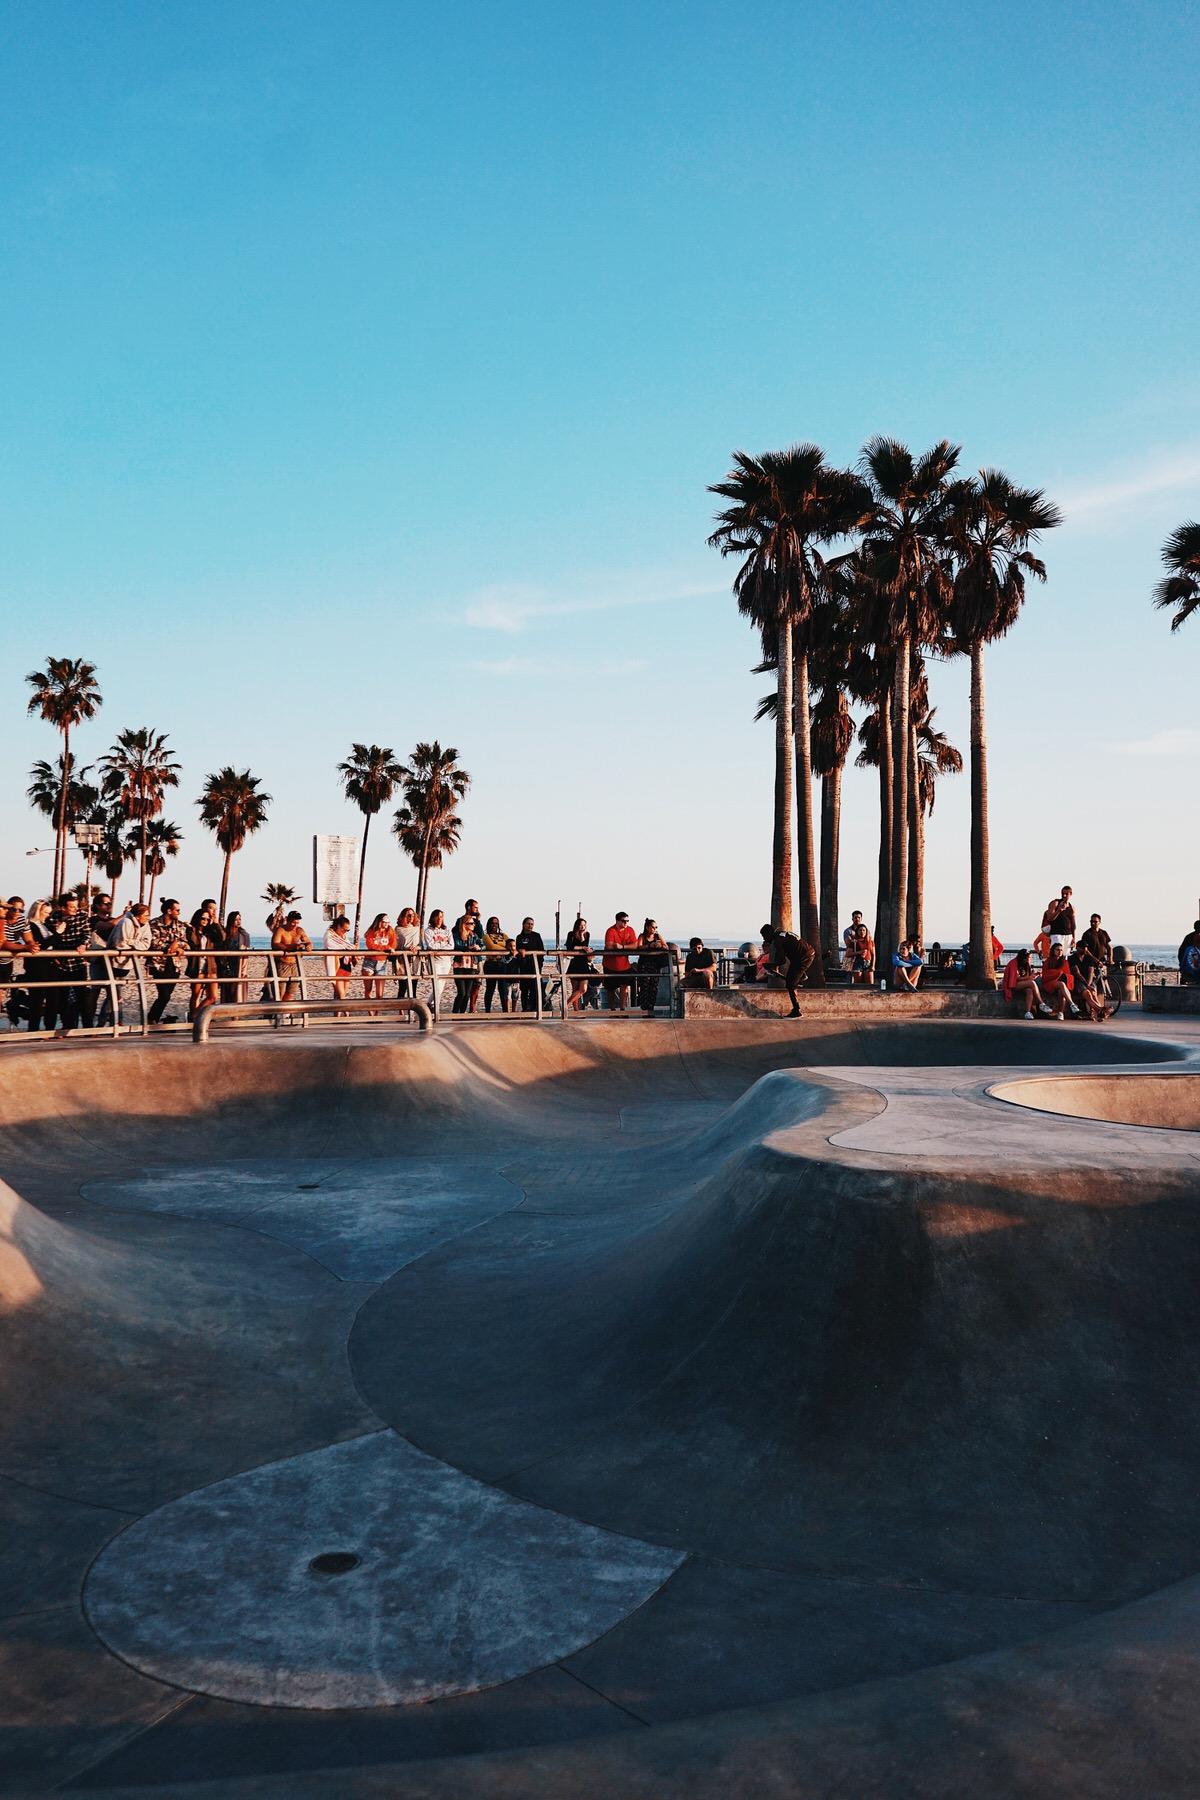 Road Trip, Los Angeles, California, Kalifornien, LA, Venice Beach, Beach, Skatepark